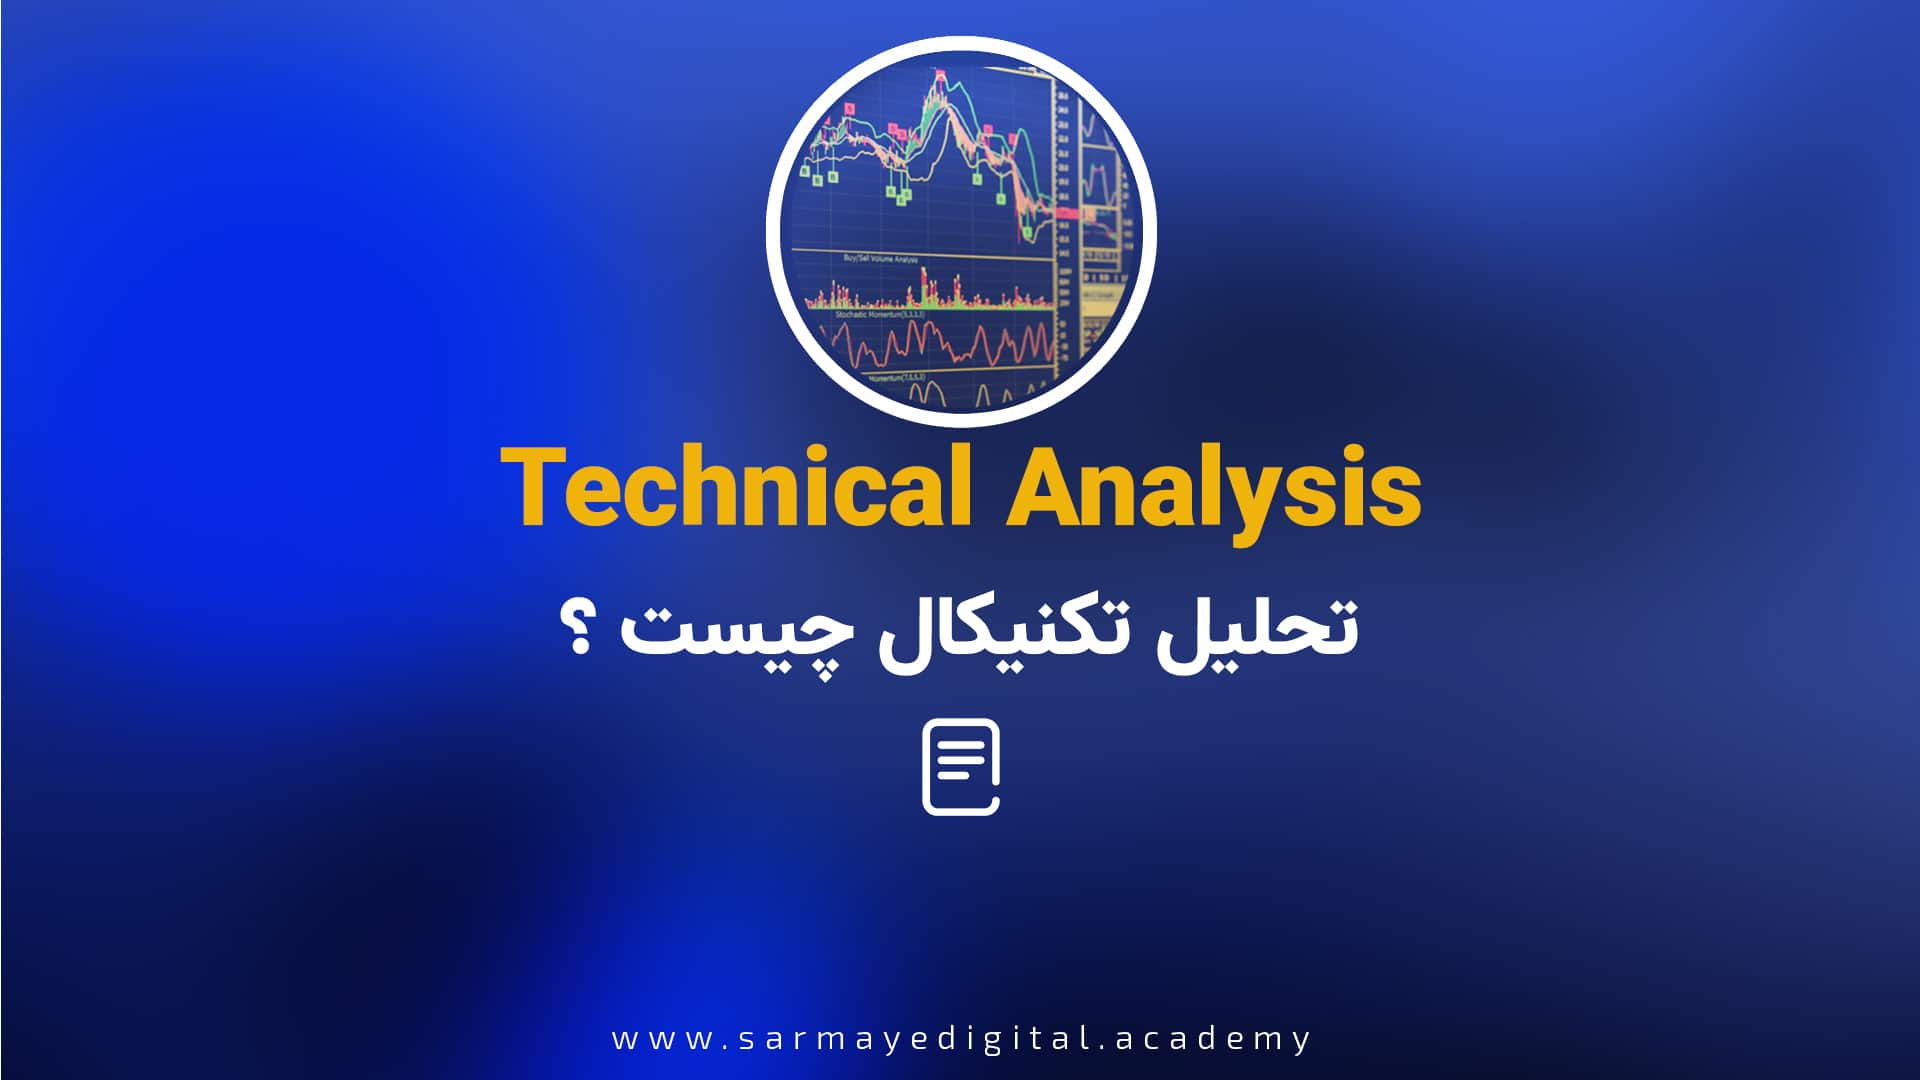 تحلیل تکنیکال